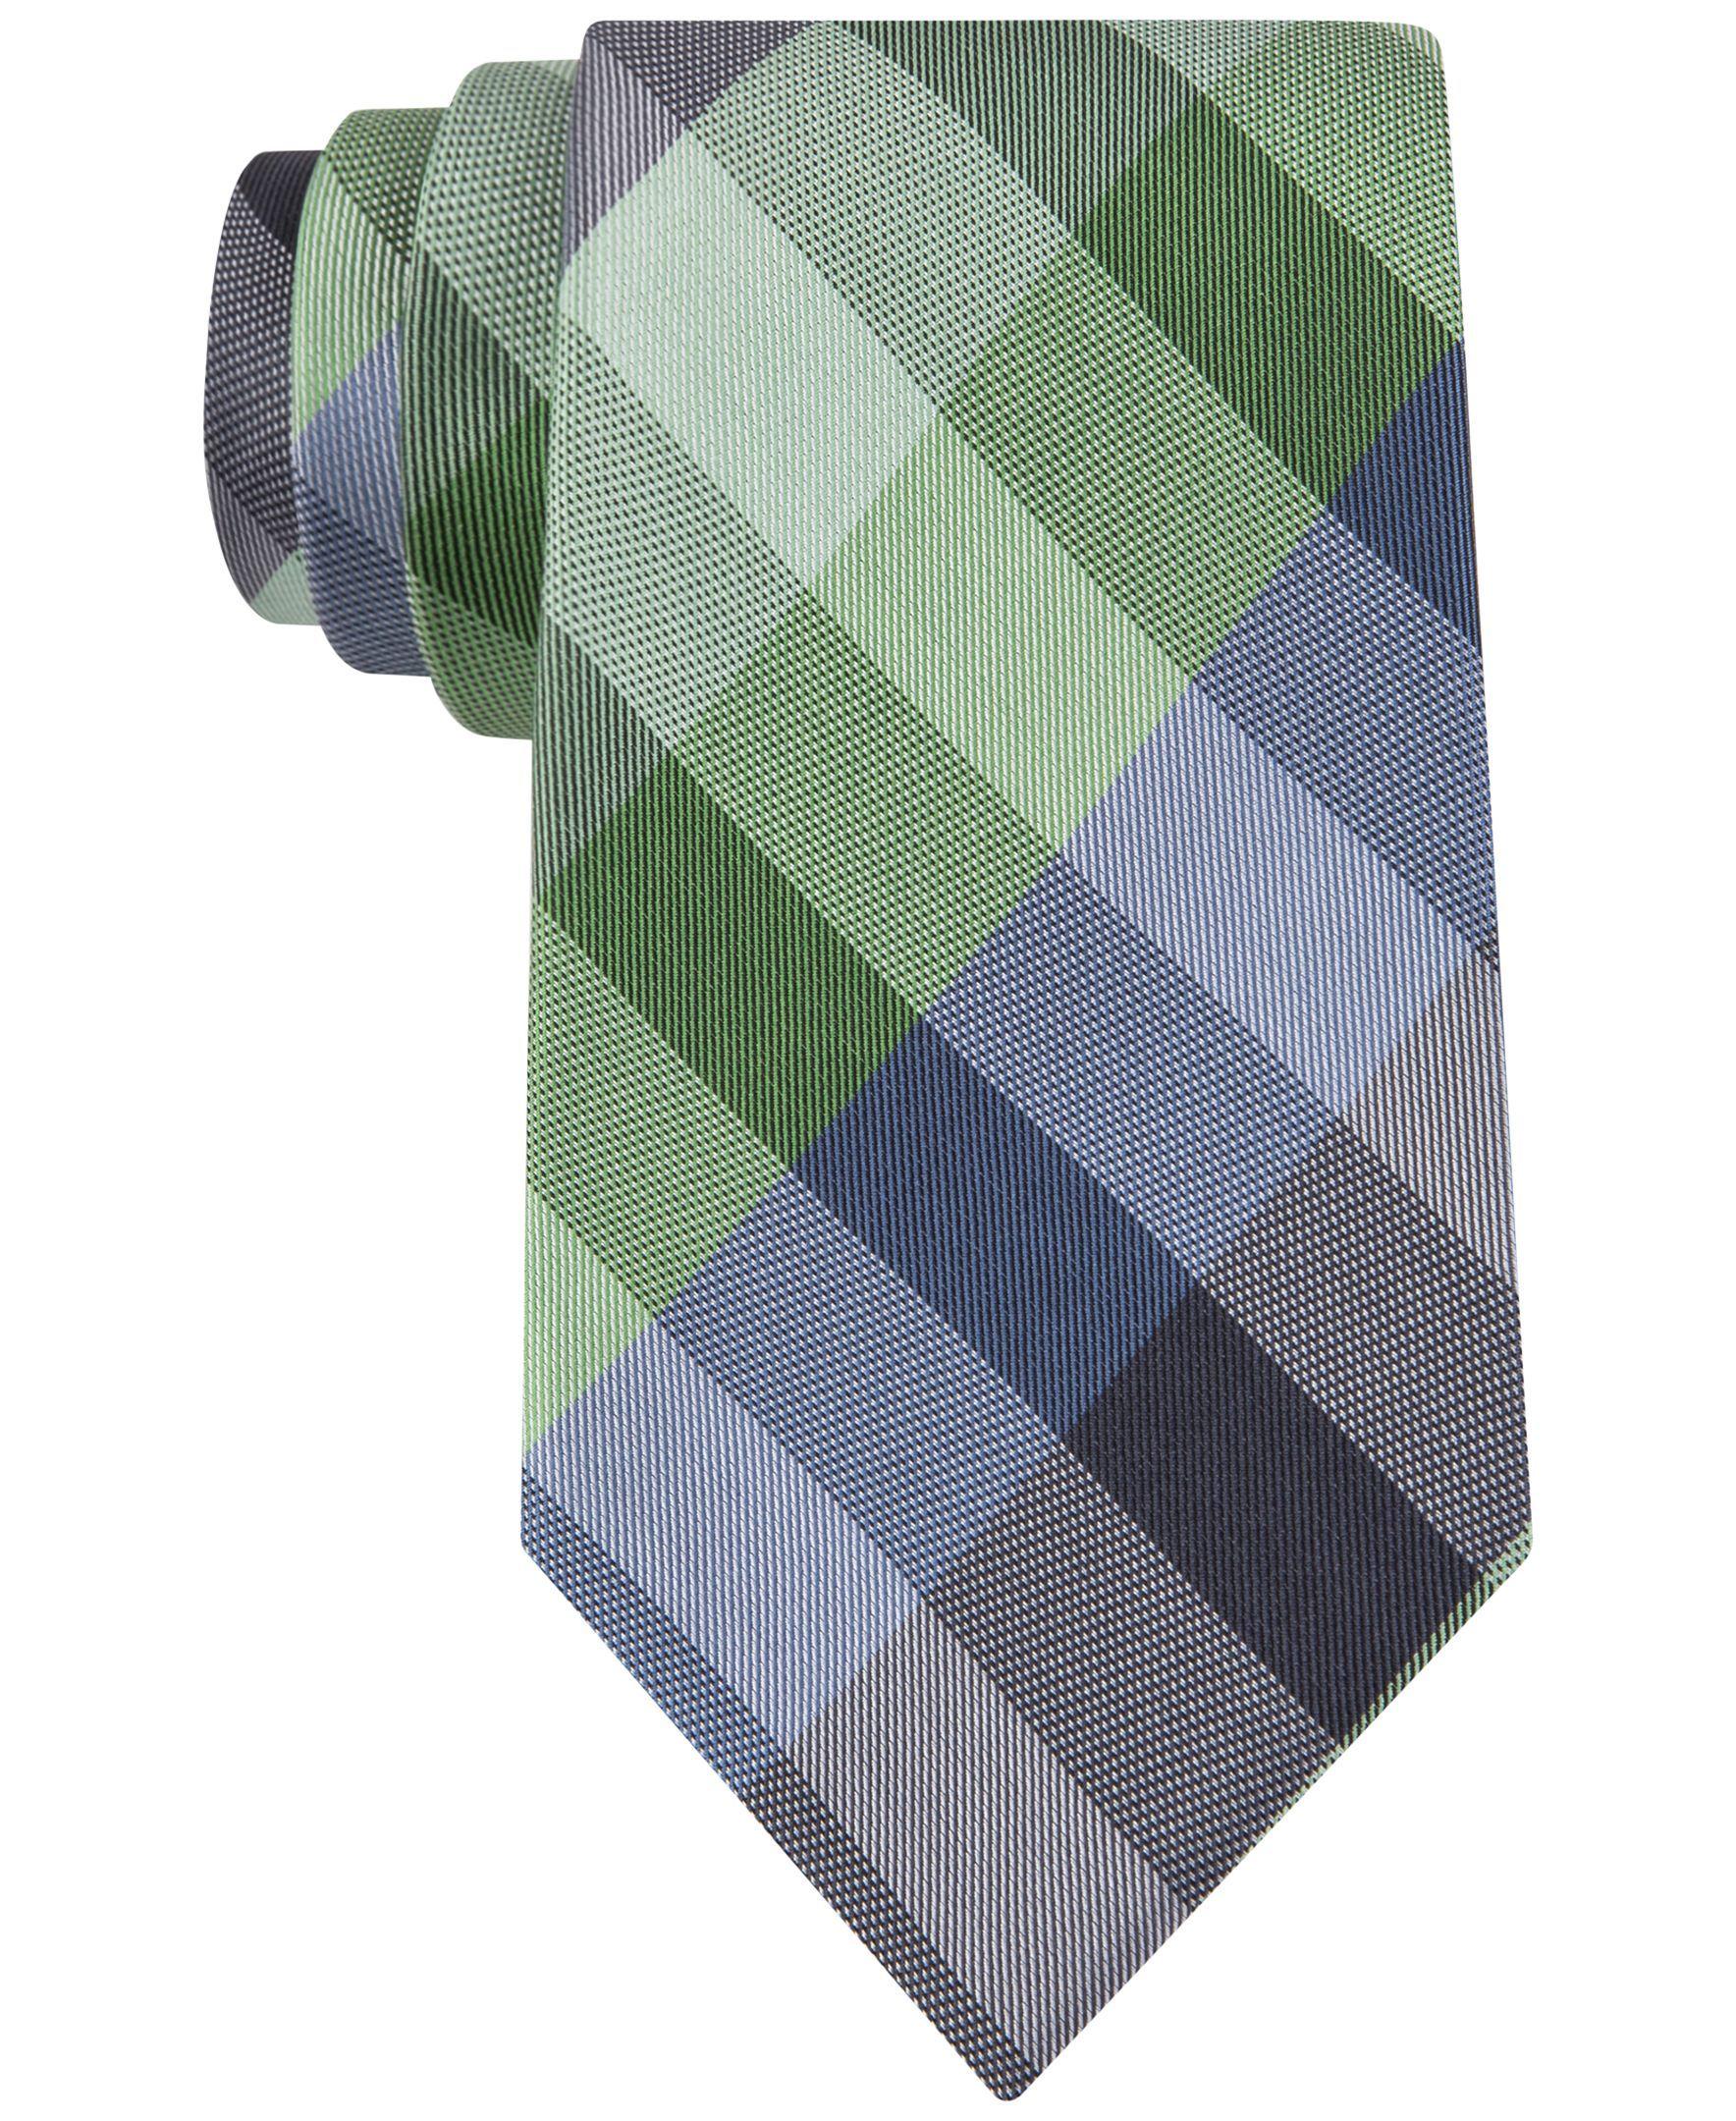 7462dae25f05 Kenneth Cole Reaction Celeste Plaid Tie Tie Online, Plaid, Pocket Squares,  Mens Fashion